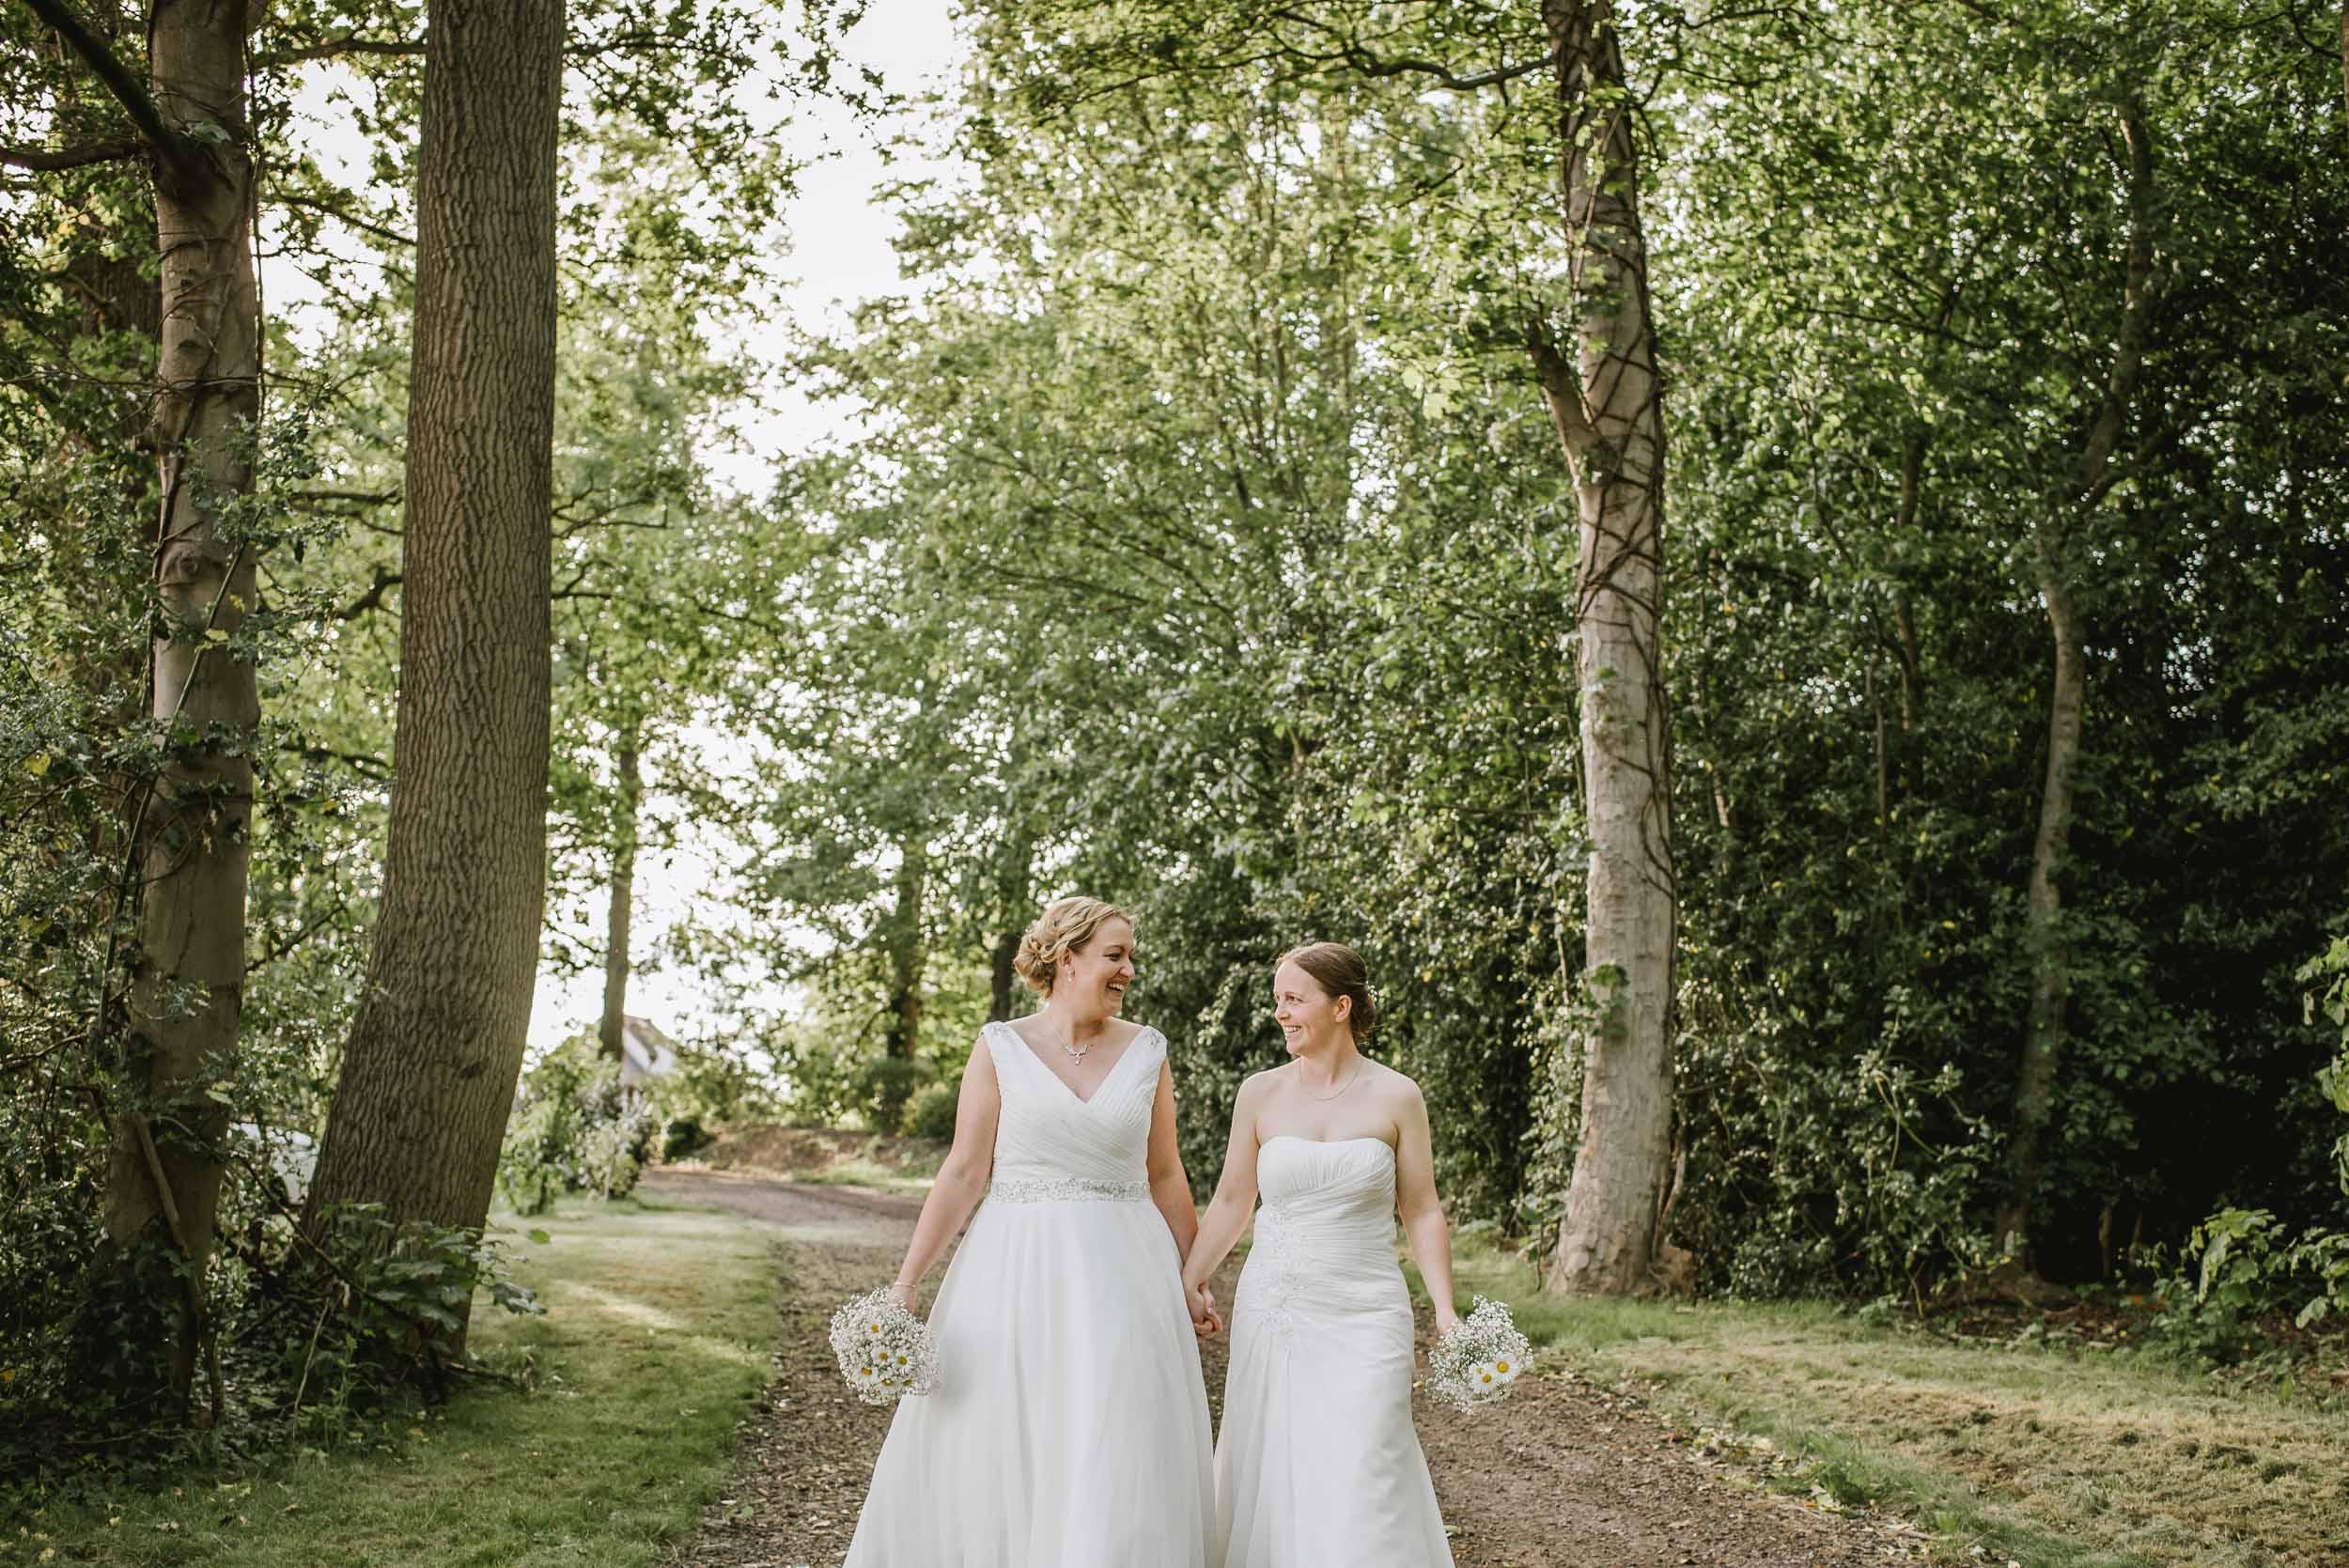 Donington-park-farm-wedding-photography-576.jpg